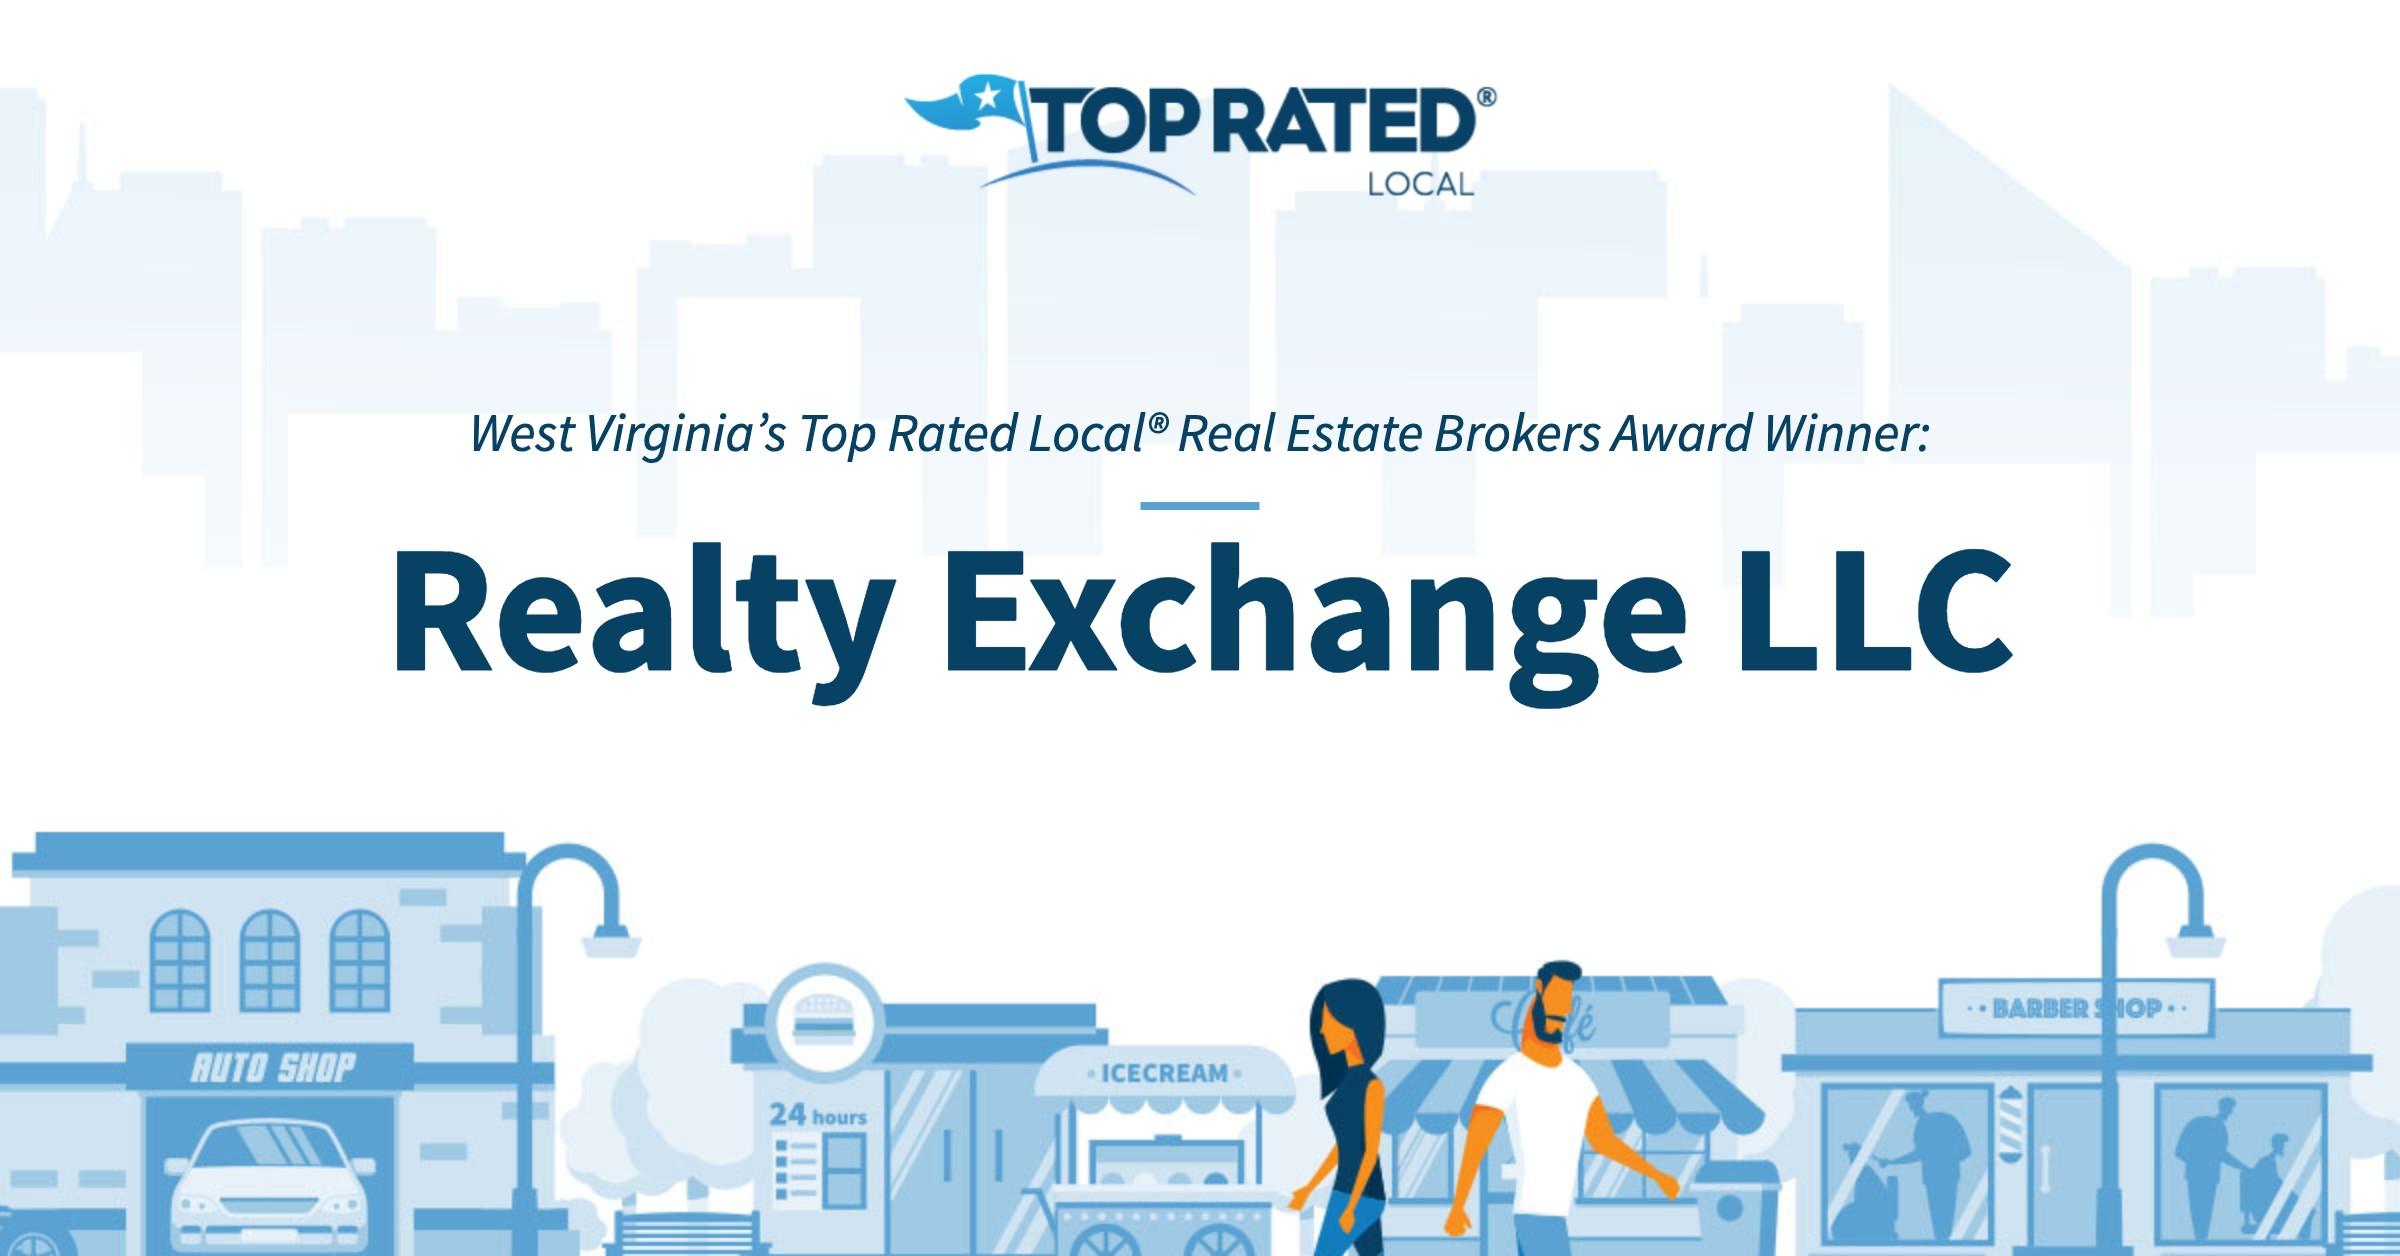 West Virginia's Top Rated Local® Real Estate Brokers Award Winner: Realty Exchange LLC